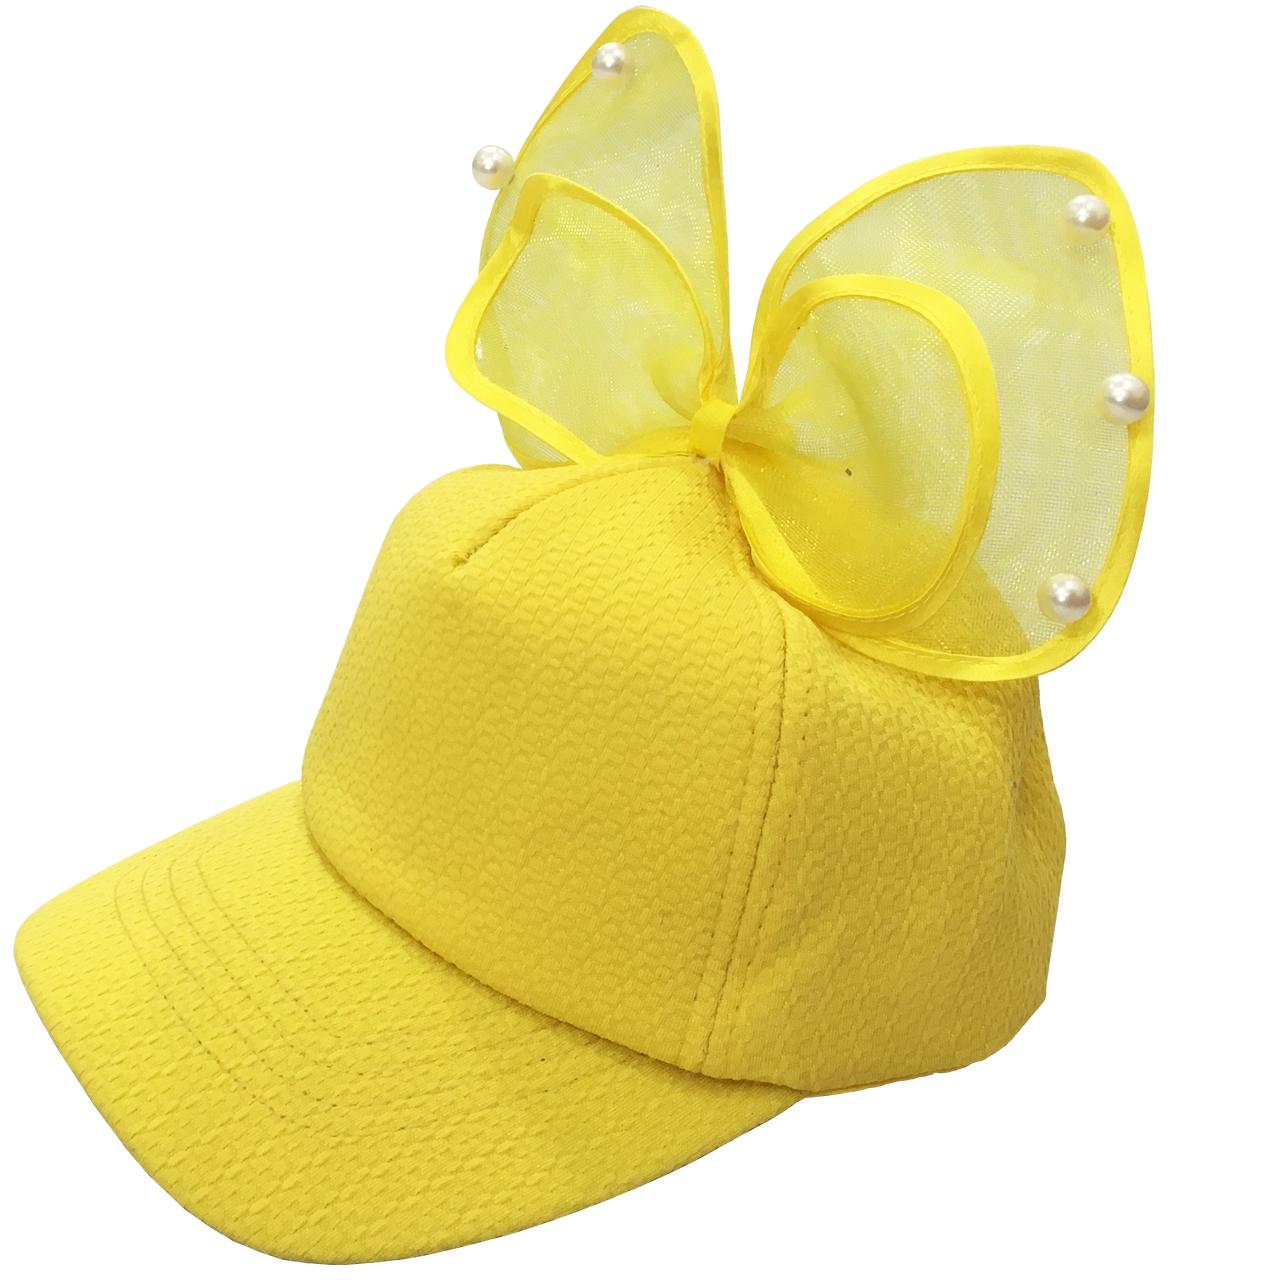 کلاه کپ دخترانه کد 140 رنگ زرد